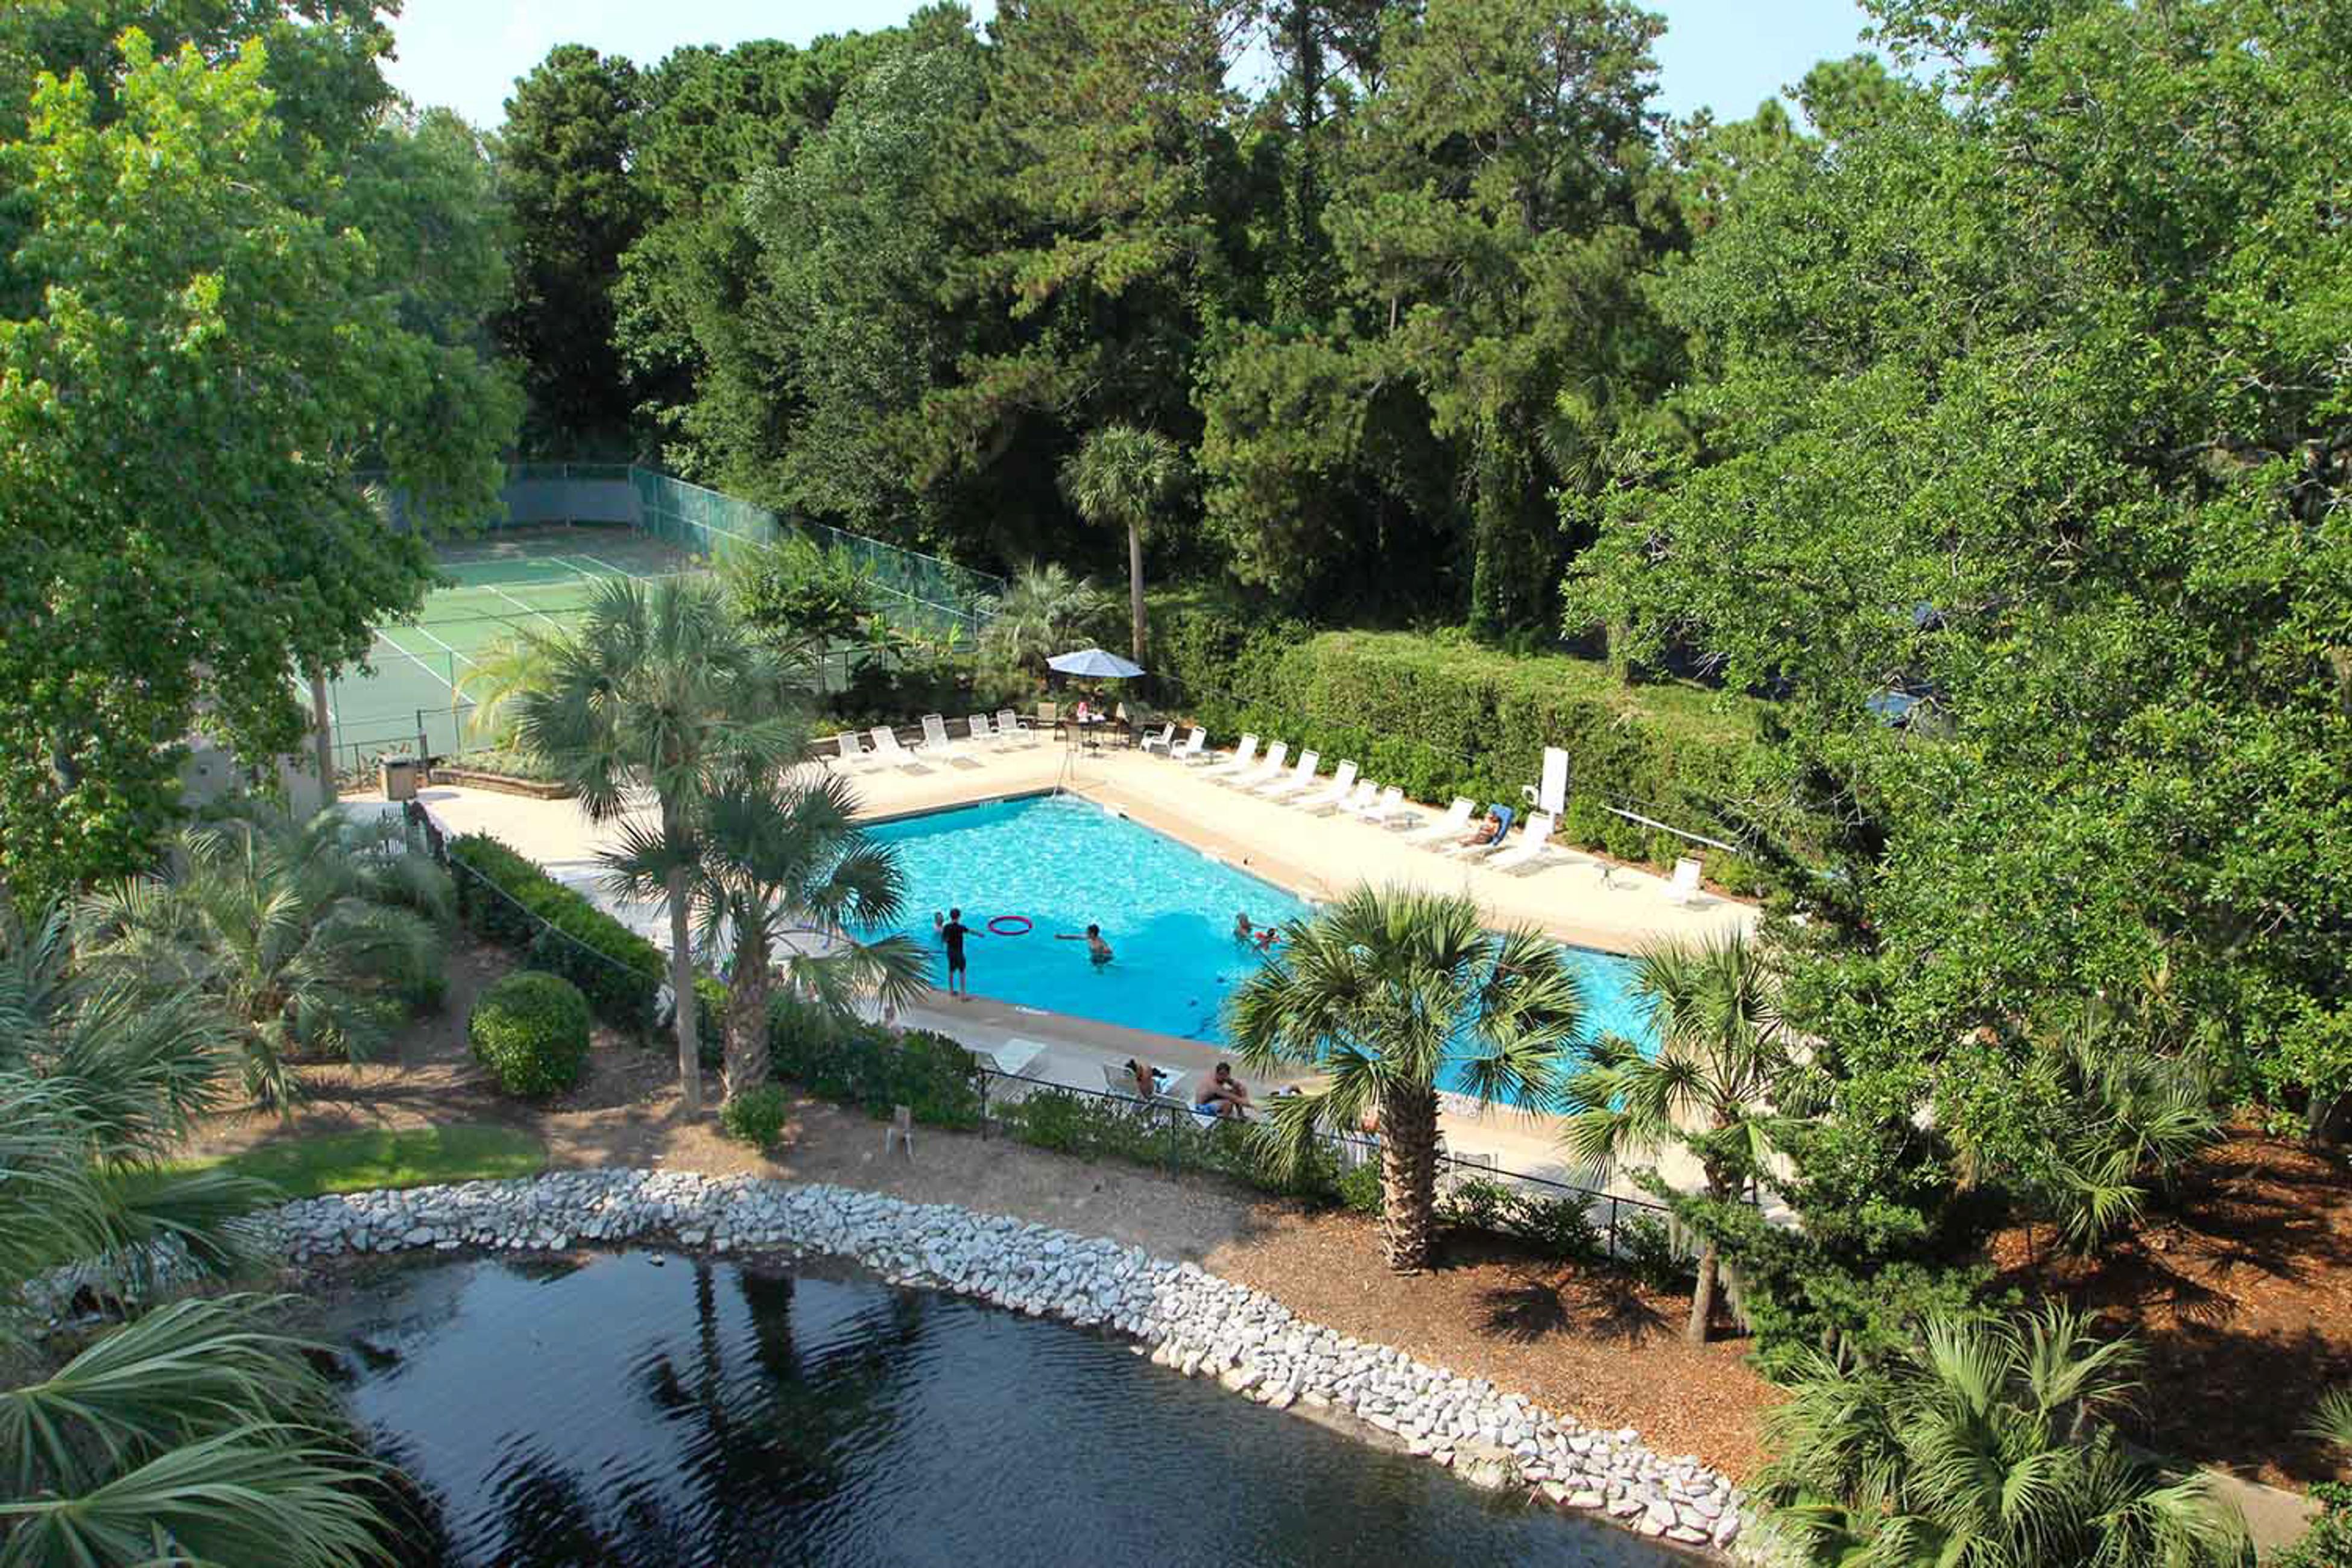 Forest Beach Villas 323  Vacation Rental in Hilton Head